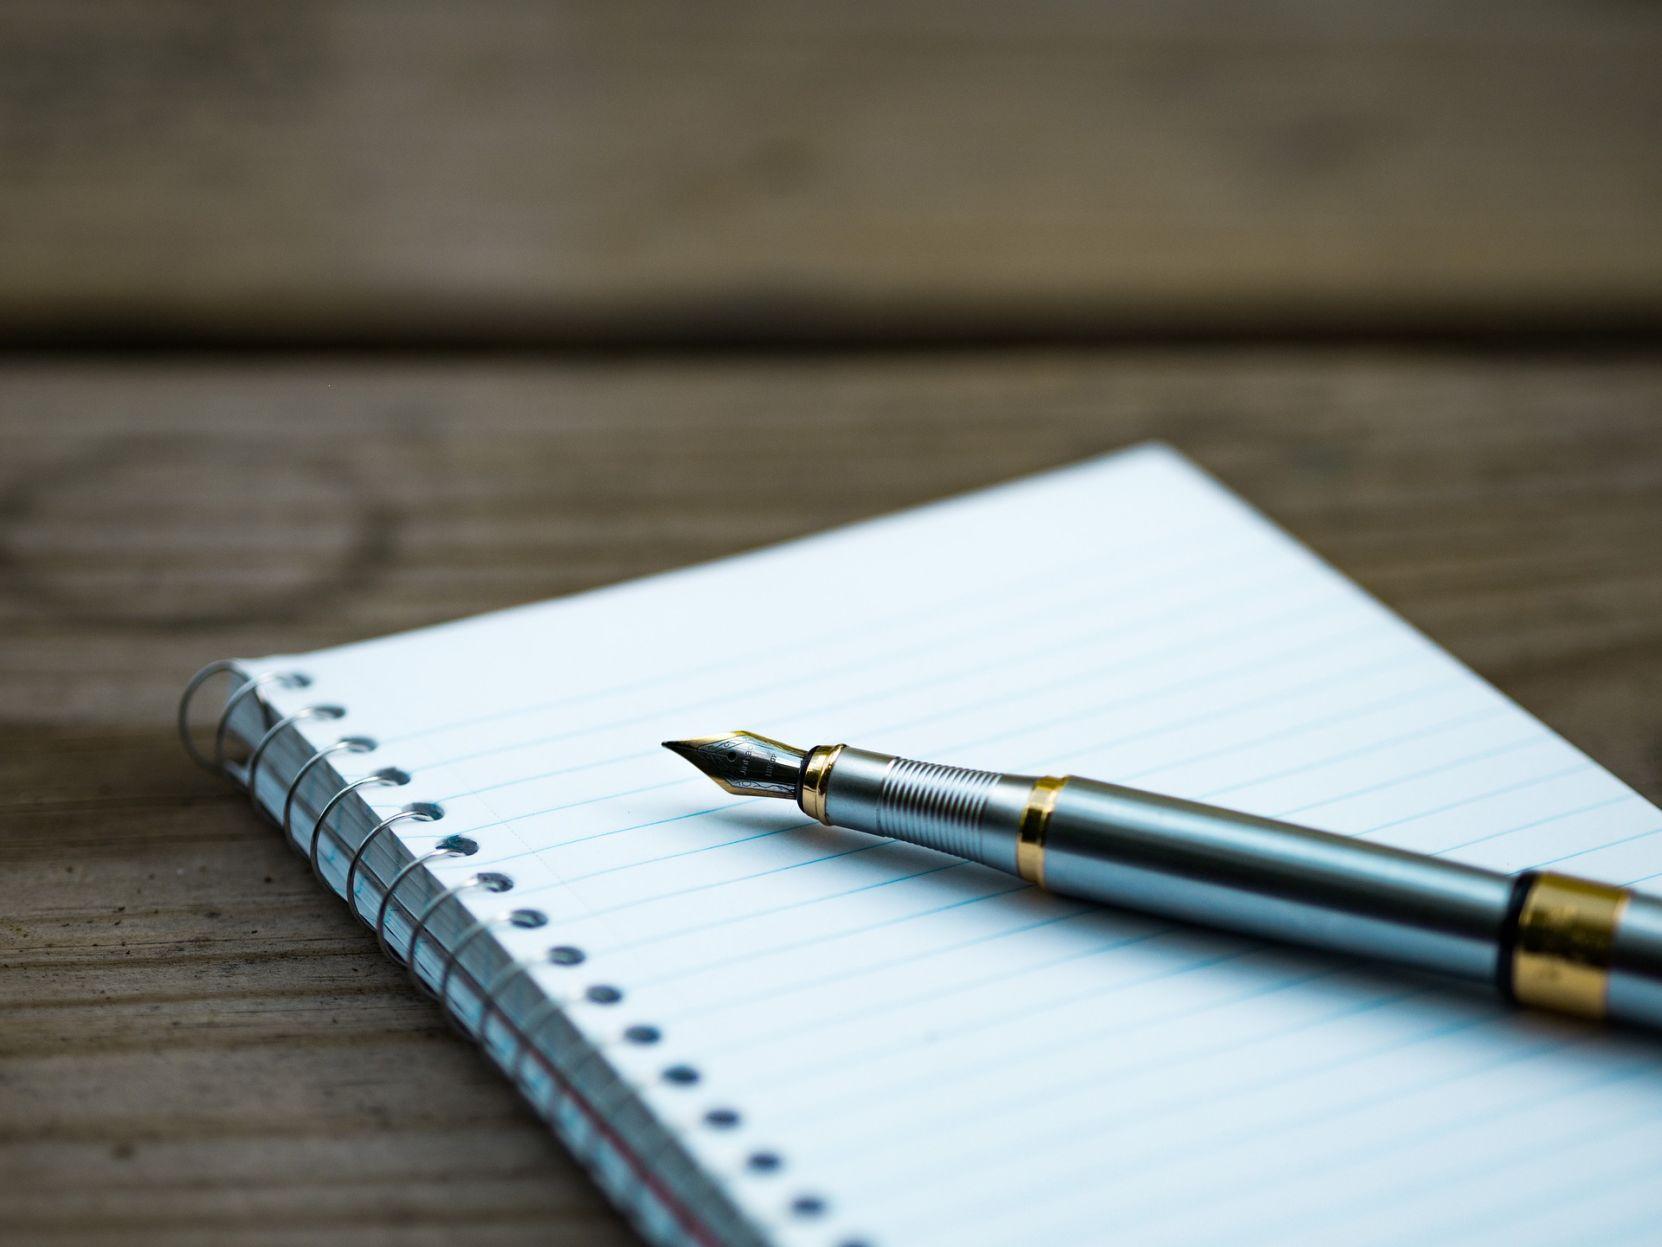 Police-EMS-Sheriff Or Plain Nite Writer Pens